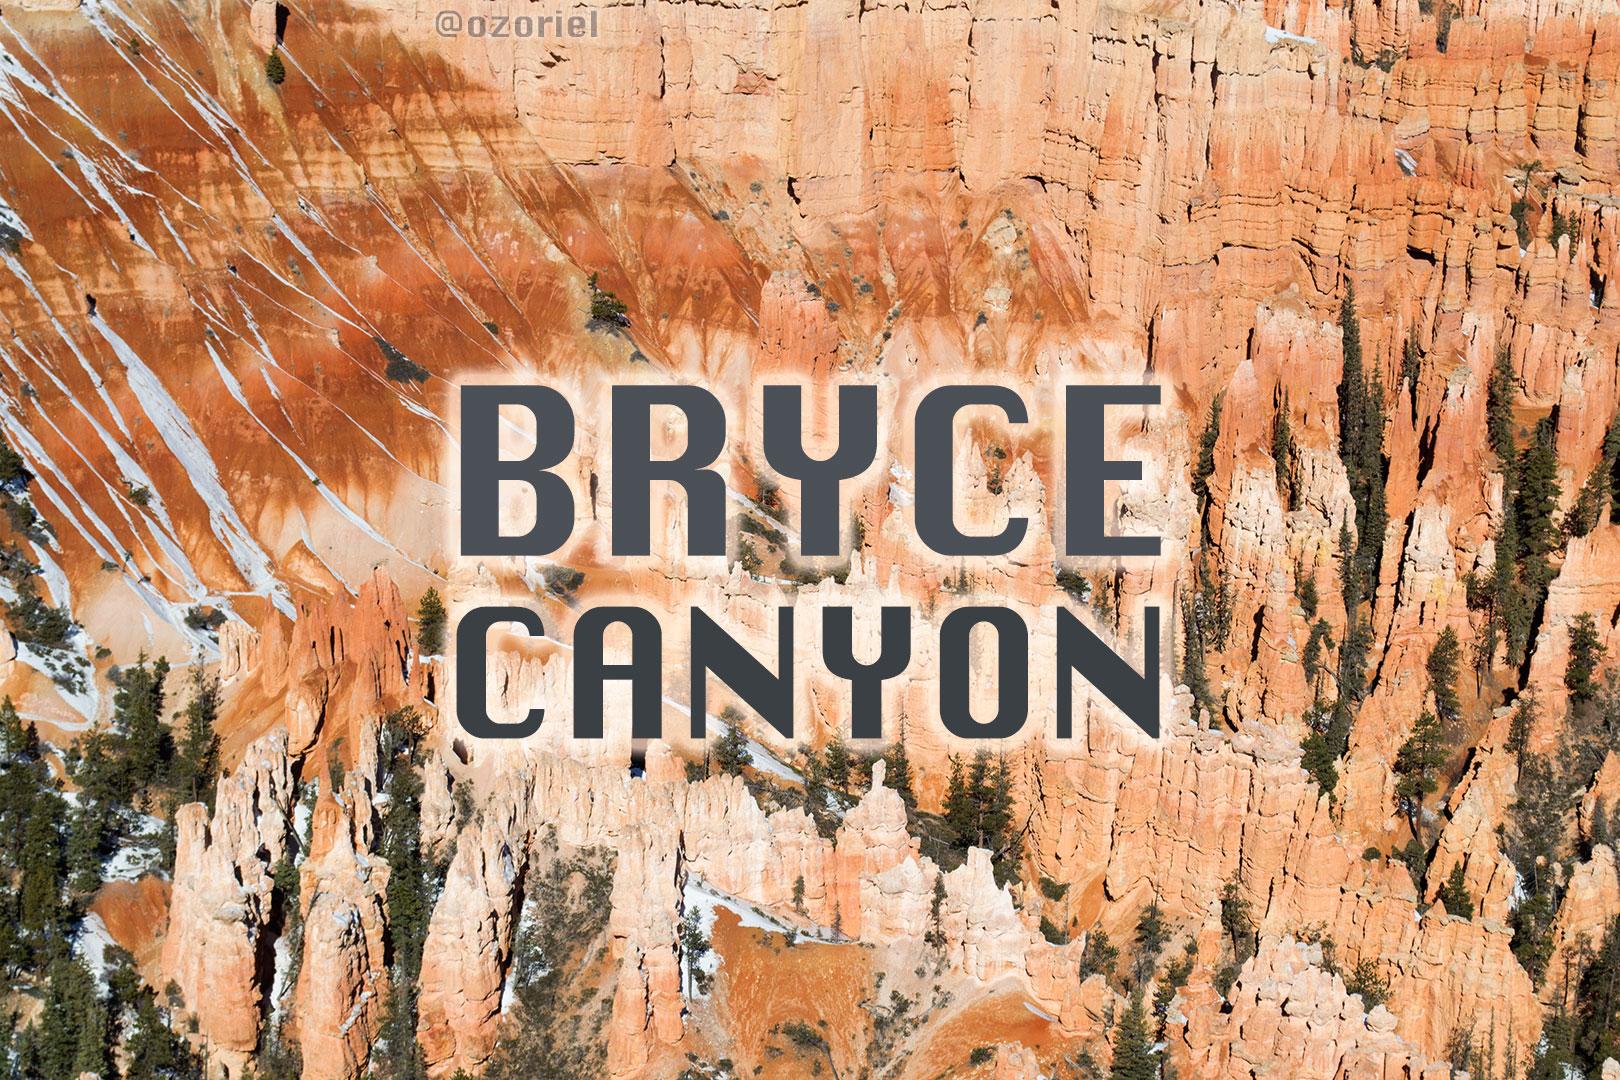 bryce canyon utah2 - The Singular Bryce Canyon National Park - Utah - United States